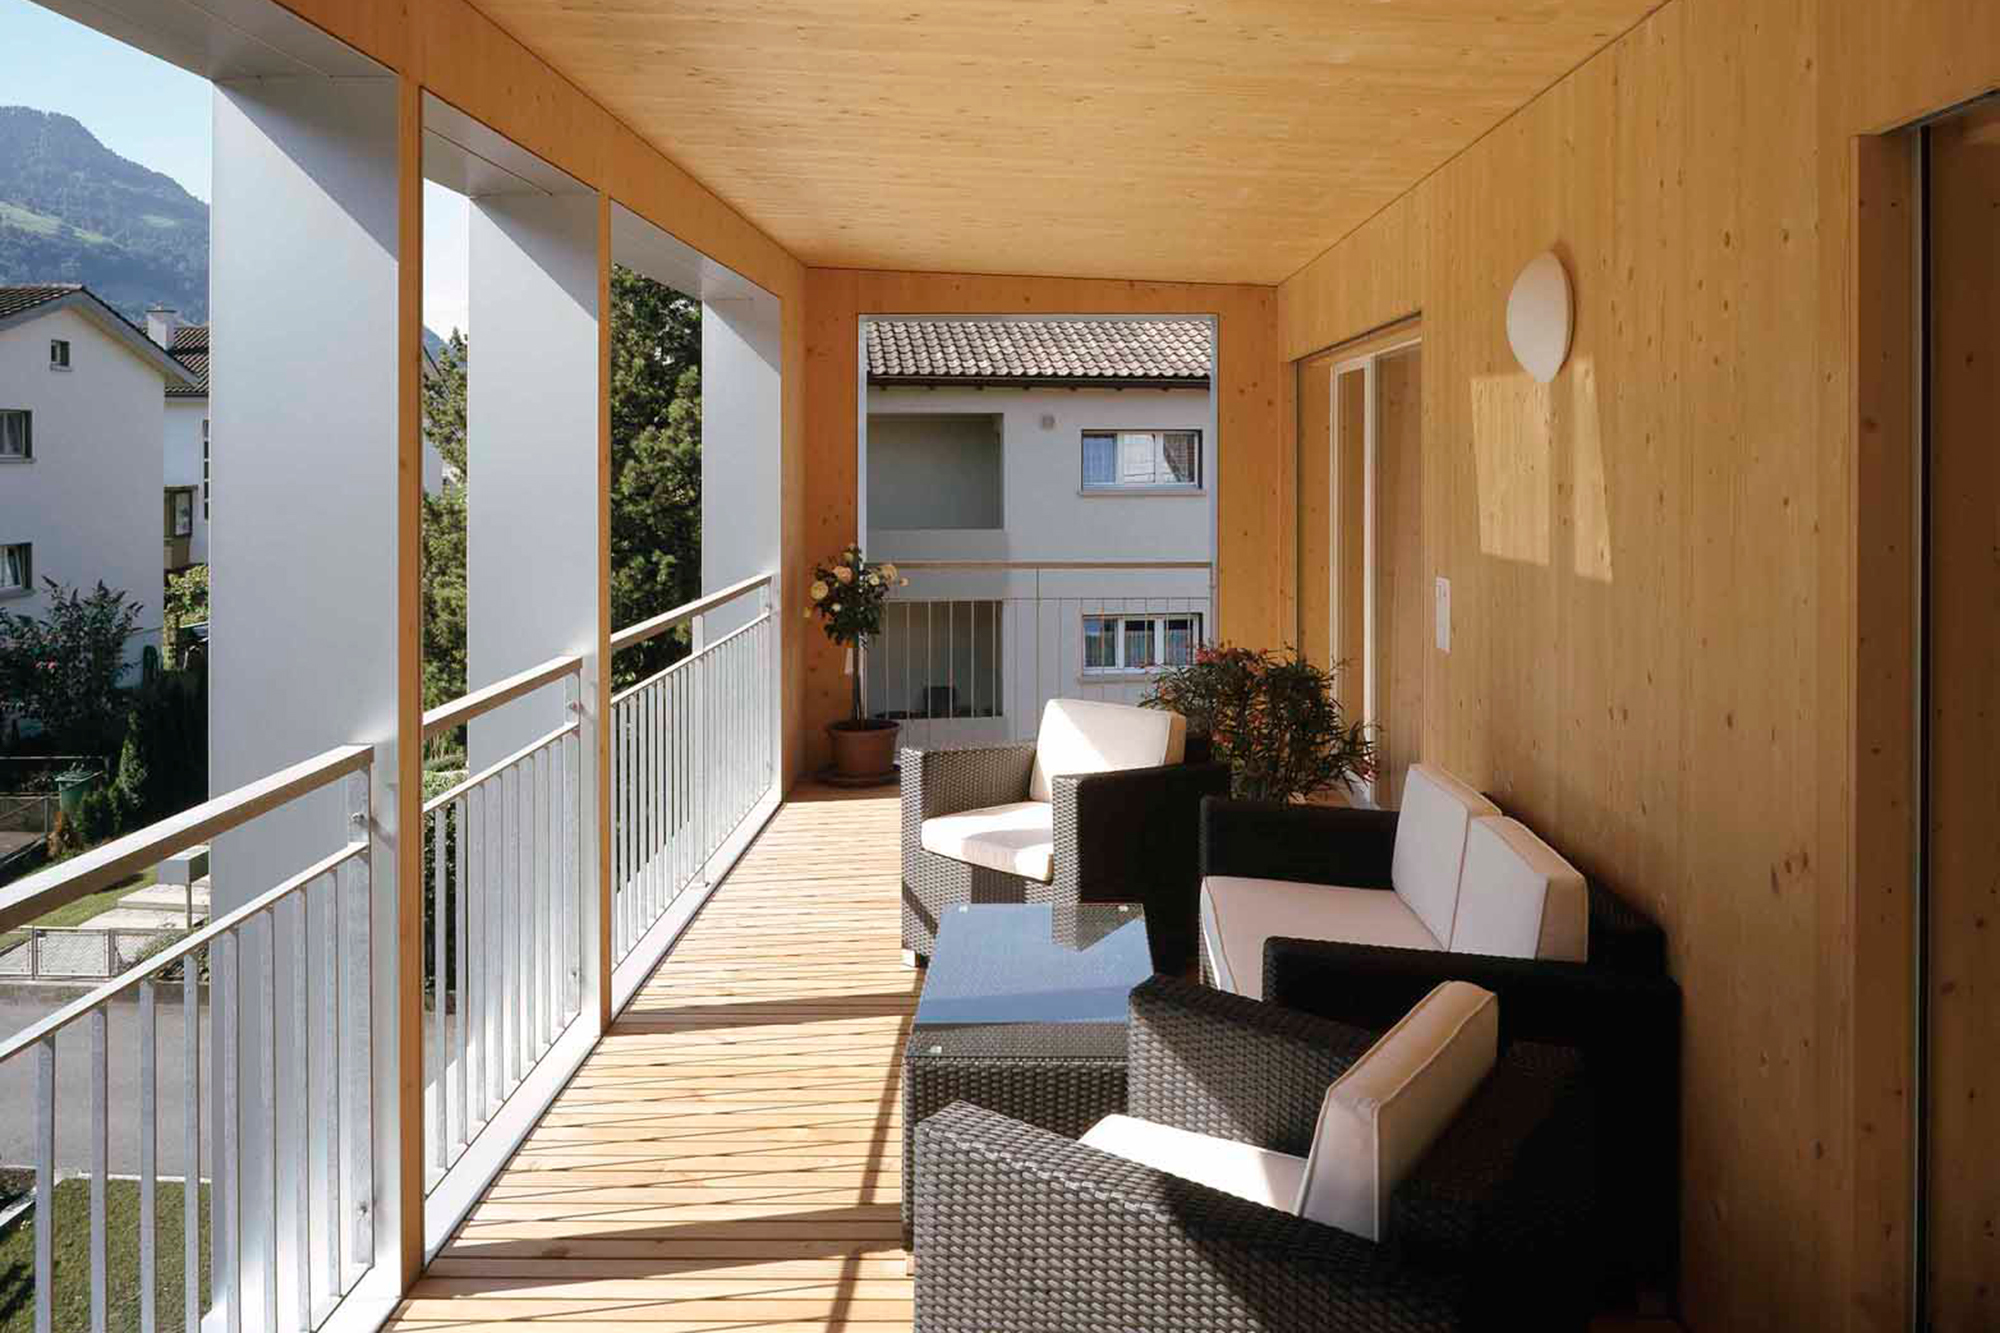 6403-Kuessnacht-Neubau-Zweifamilienhaus-2044-Bild-5@2x